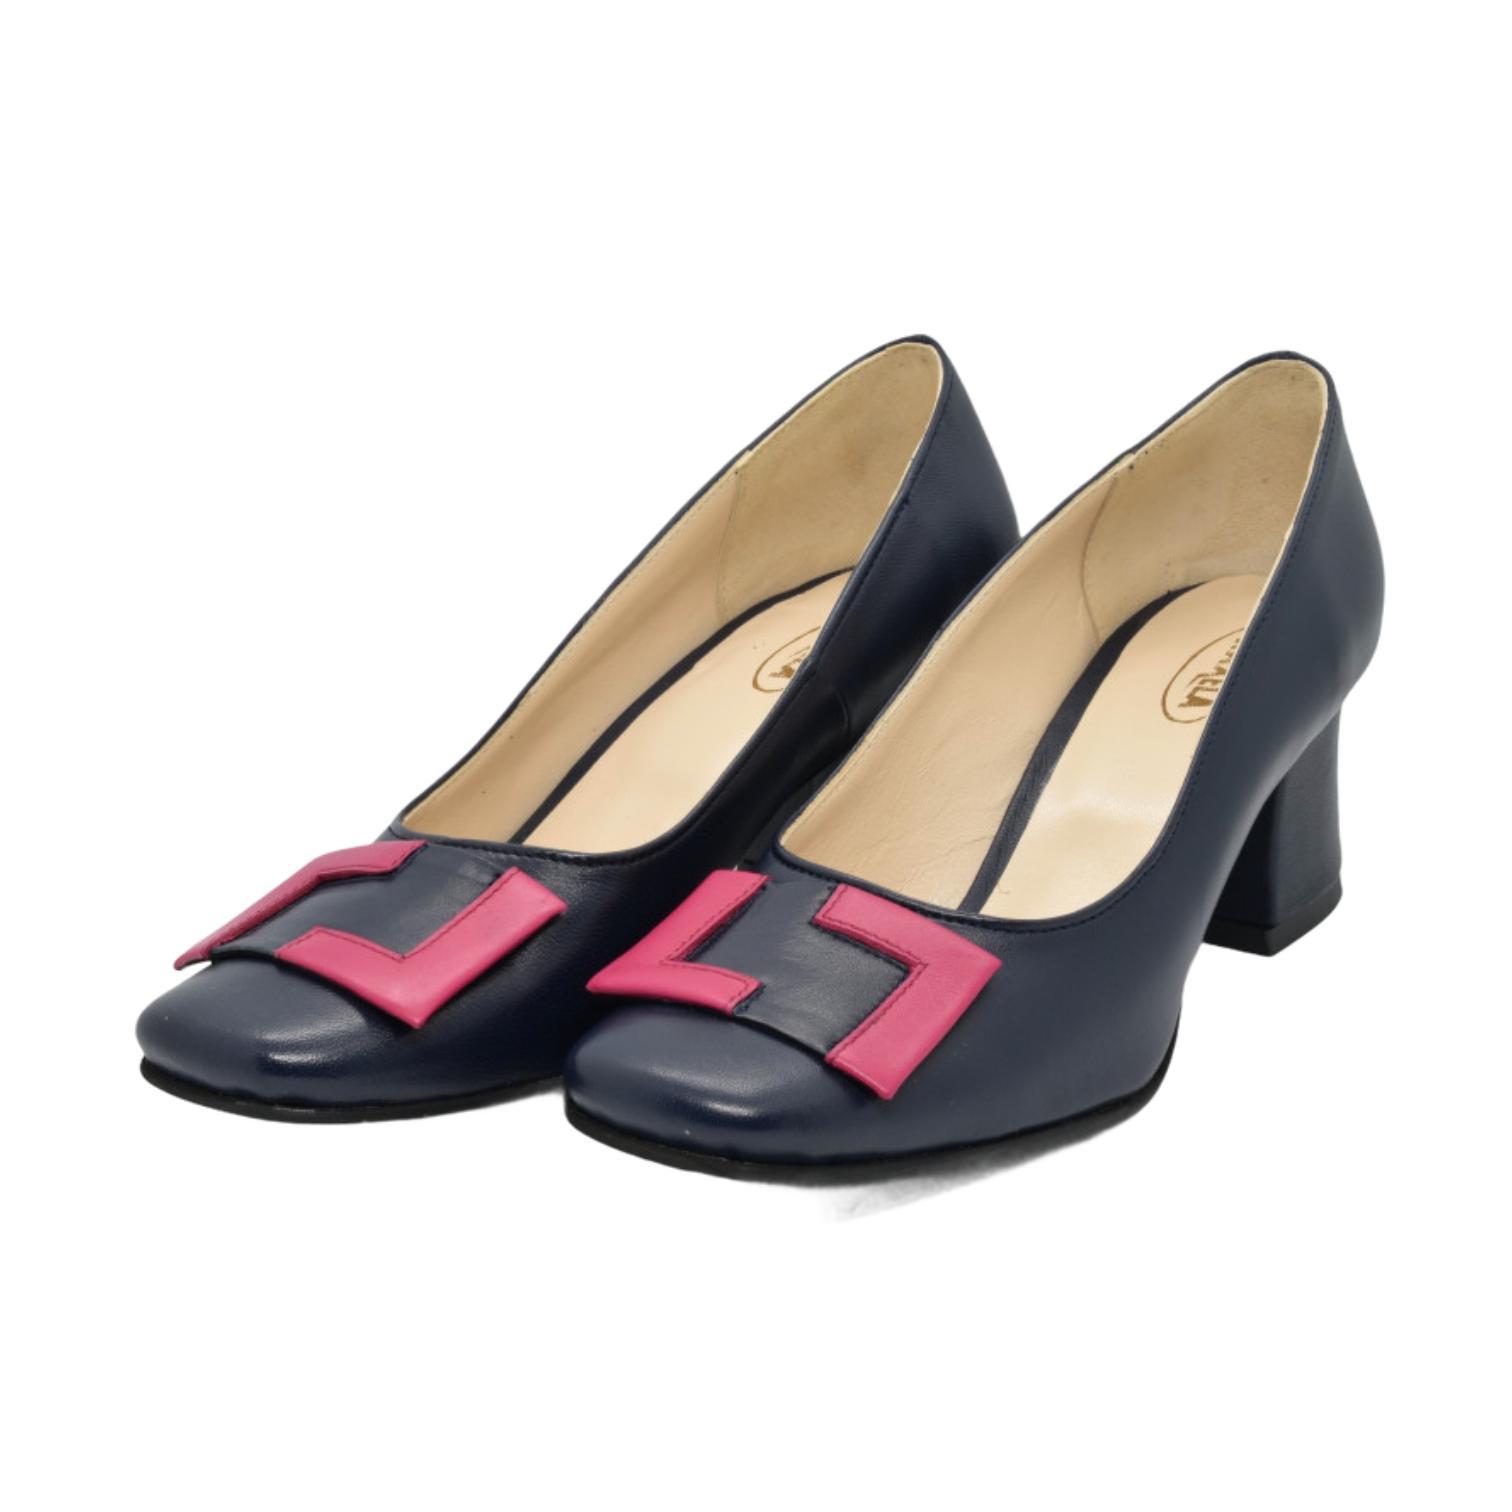 Pantofi bleumarin cu accesoriu fuxia